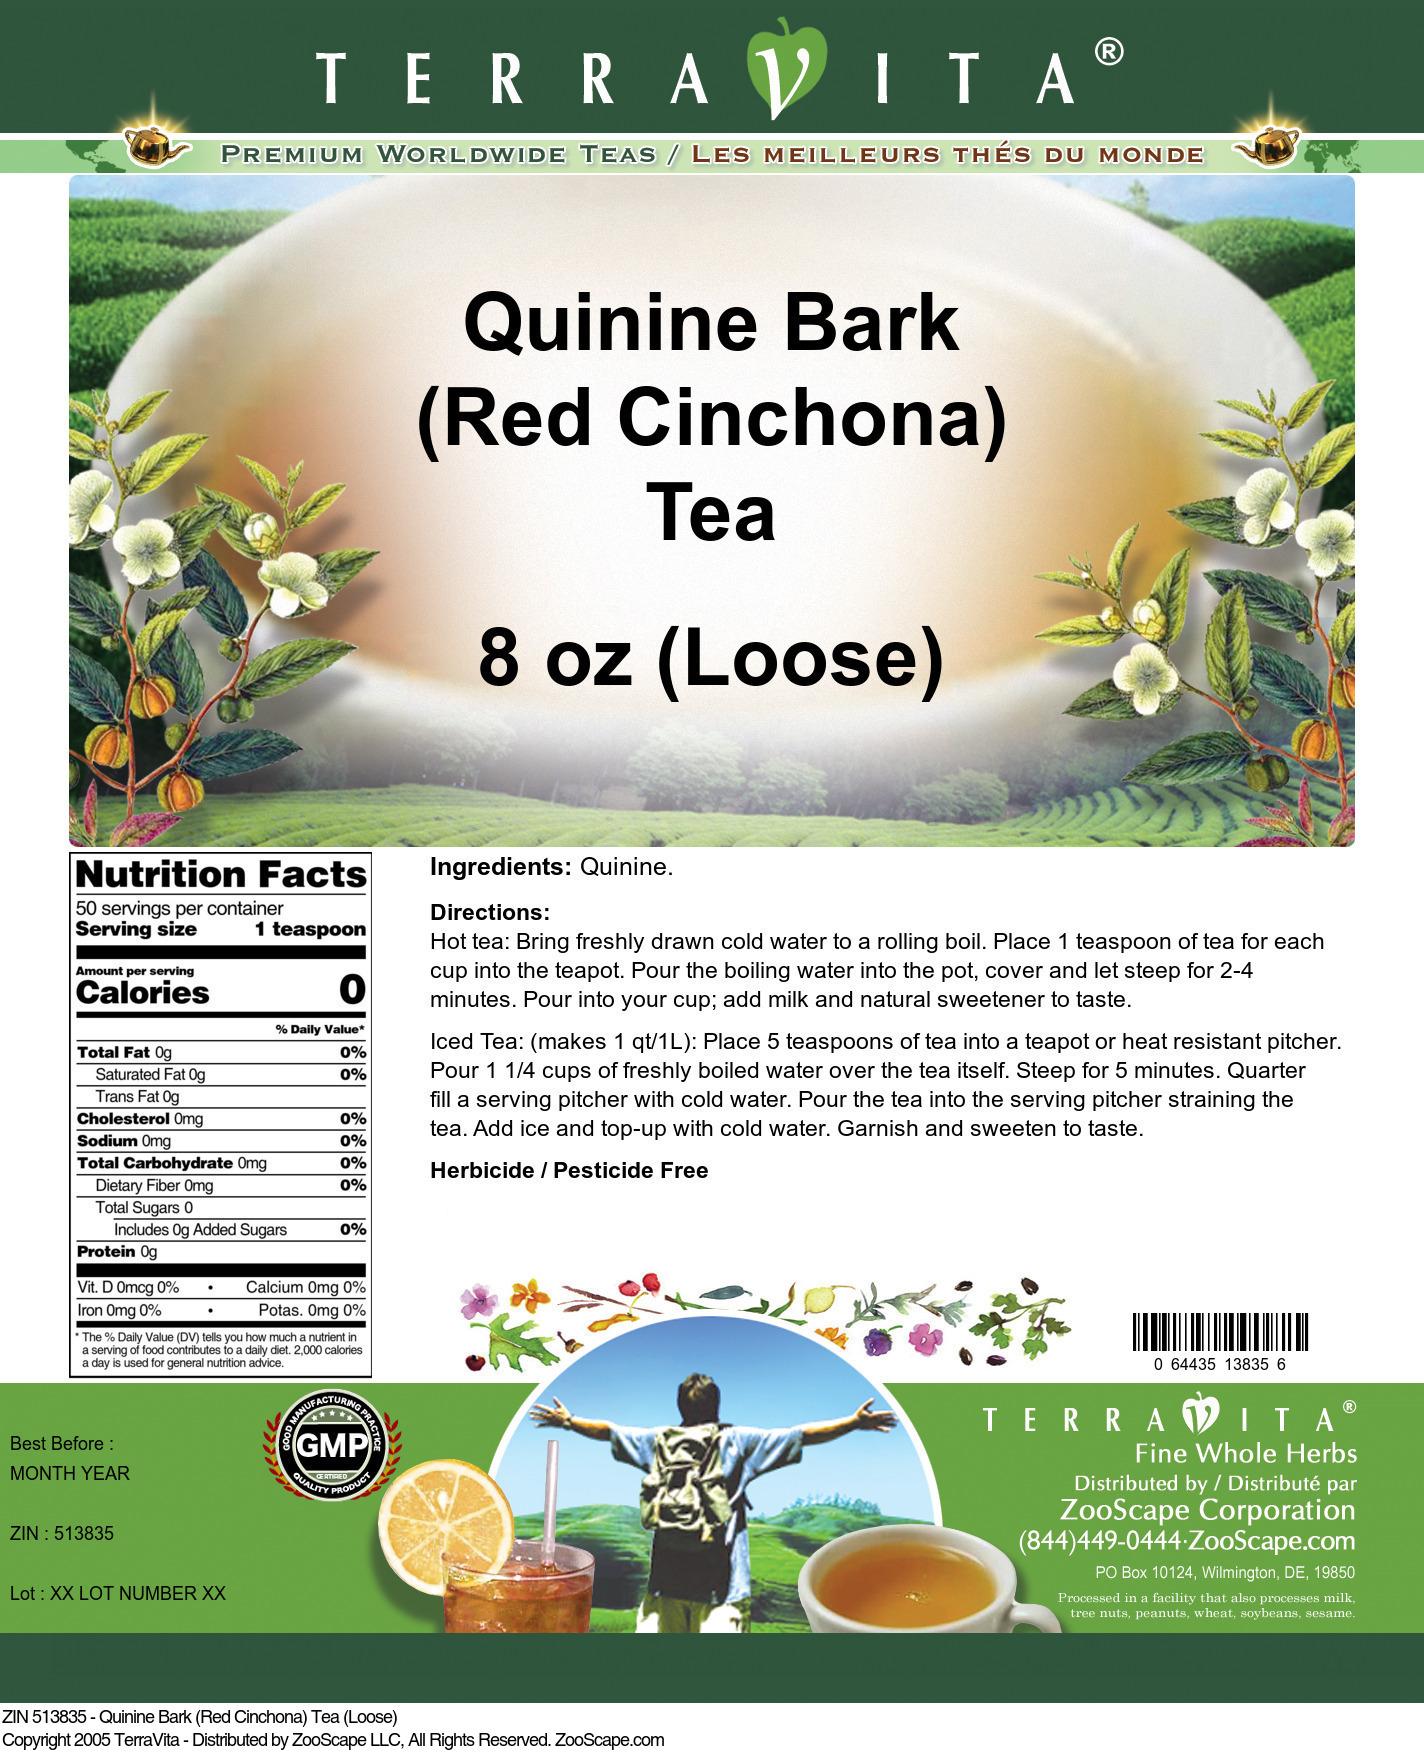 Quinine Bark (Red Cinchona) Tea (Loose)